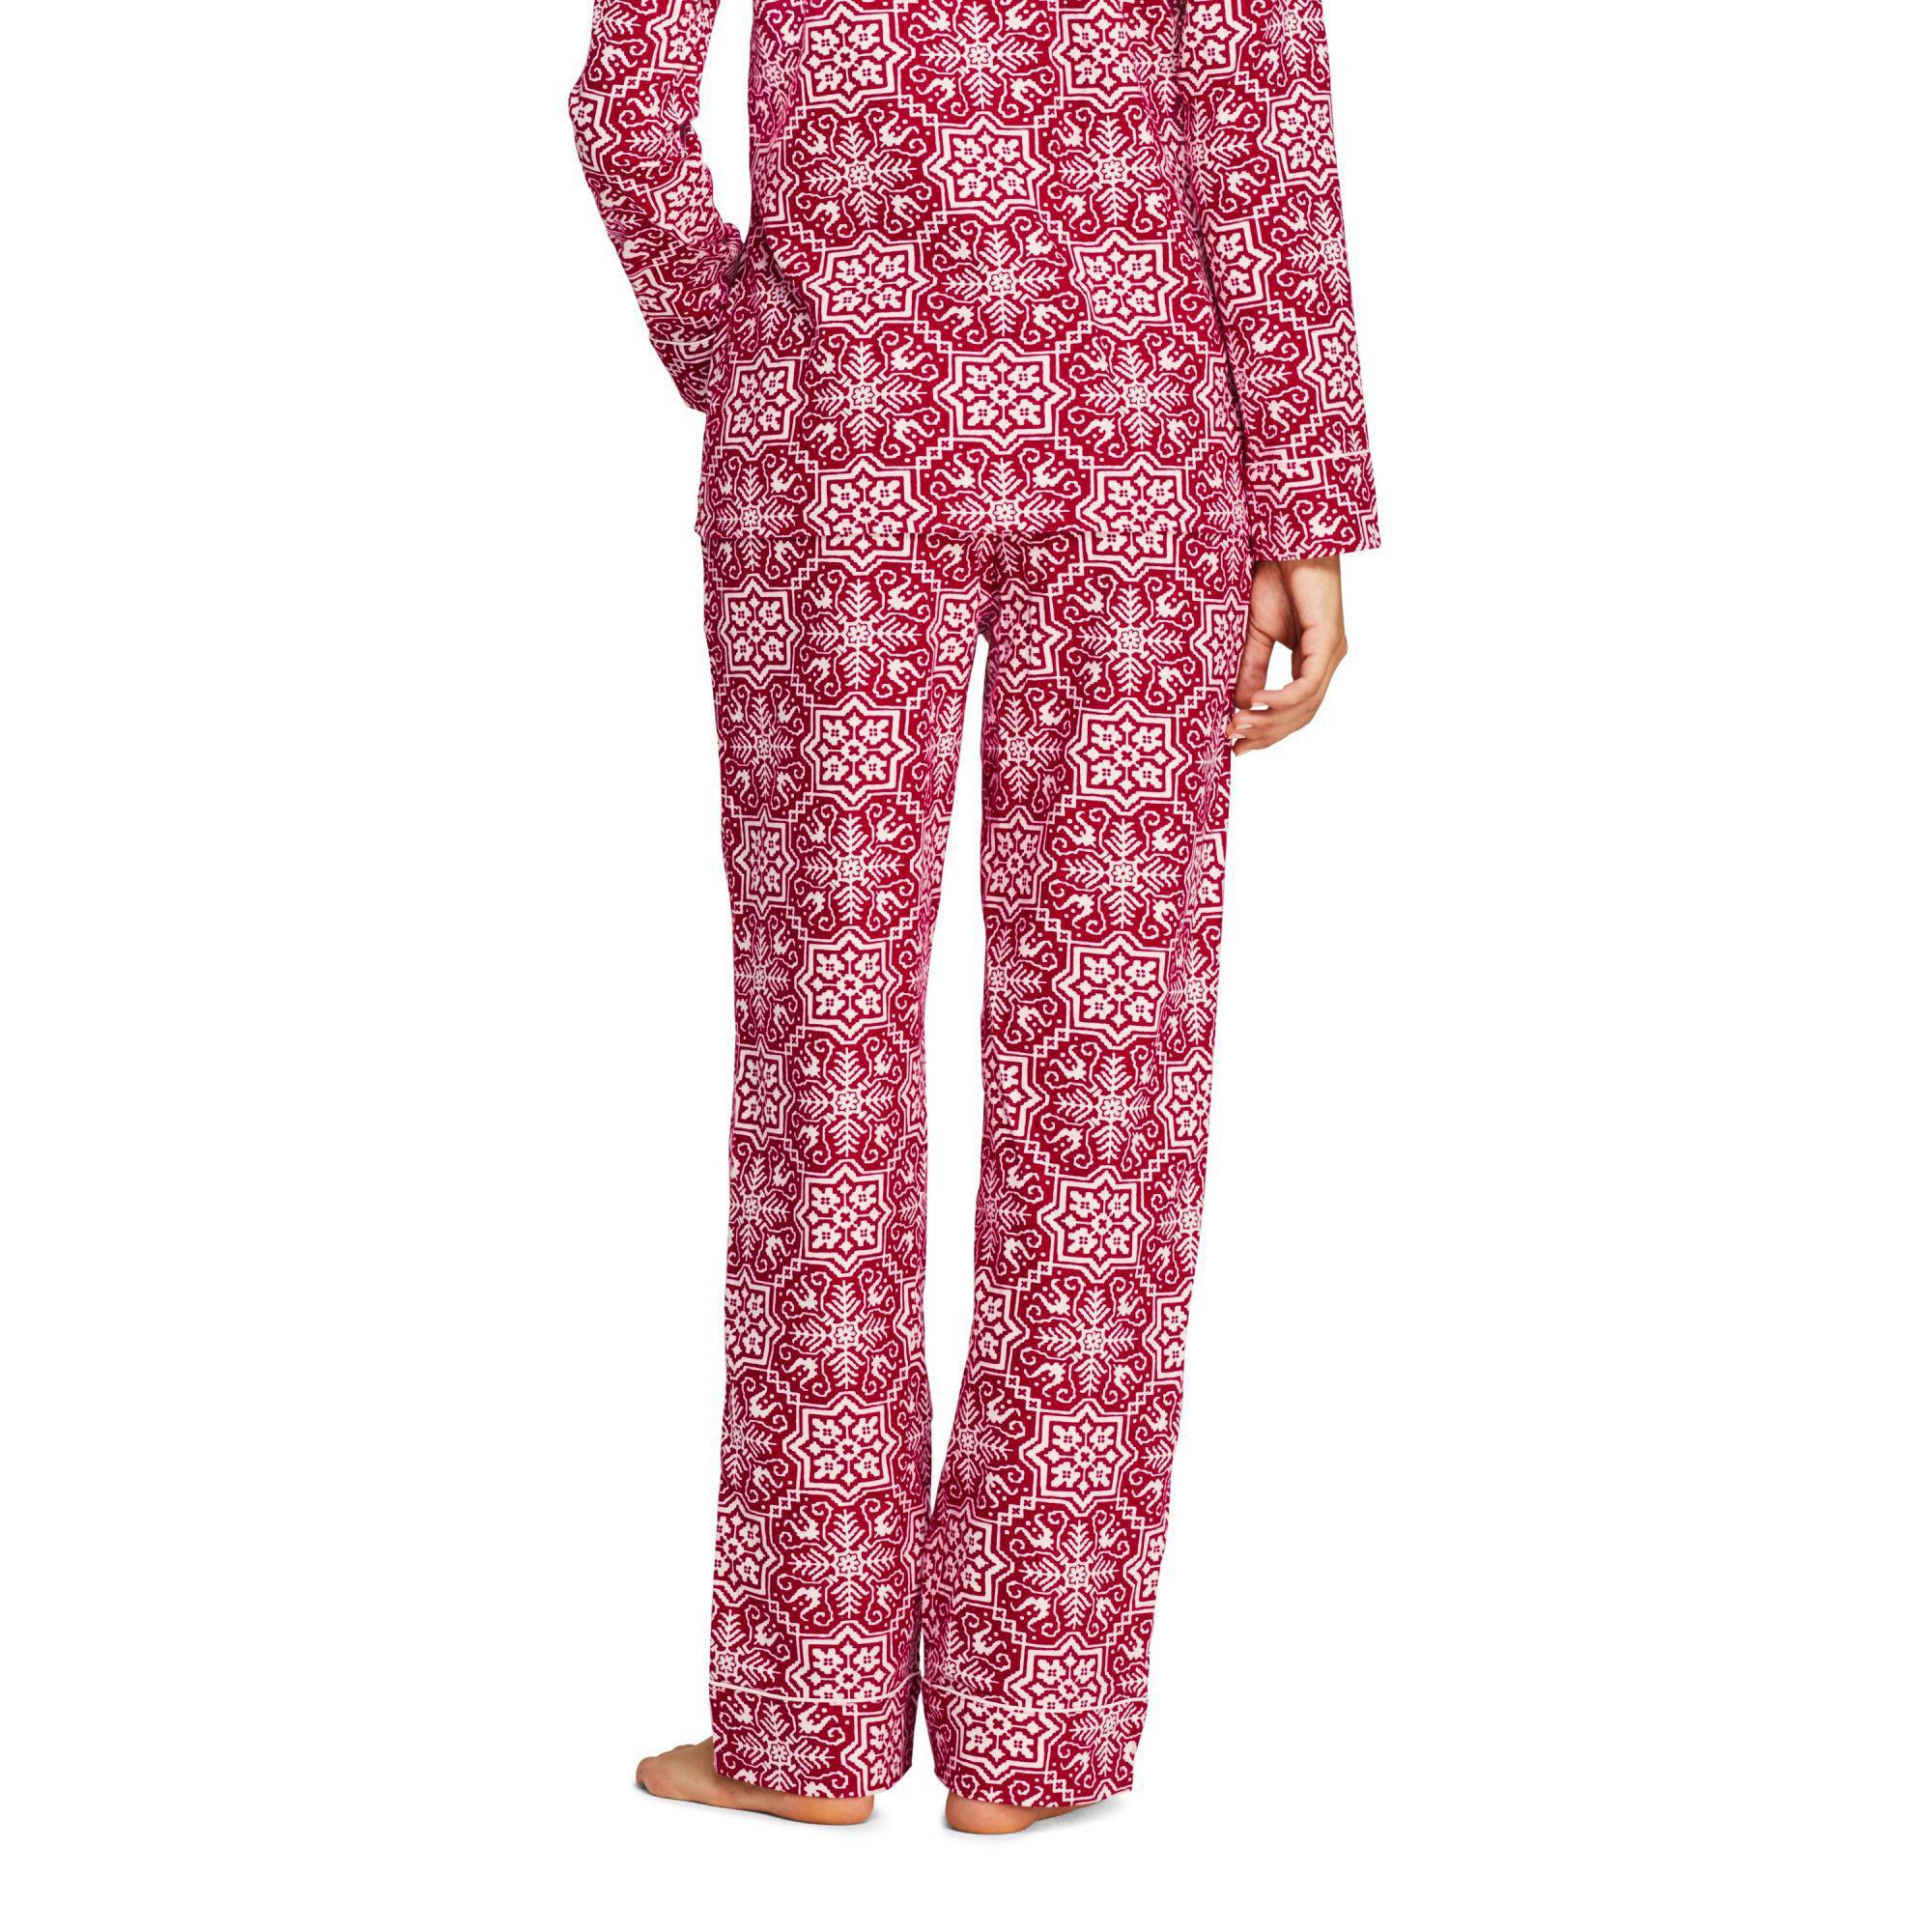 27725eb8ef Lands  End - Red Flannel Patterned Pyjama Bottoms - Lyst. View fullscreen